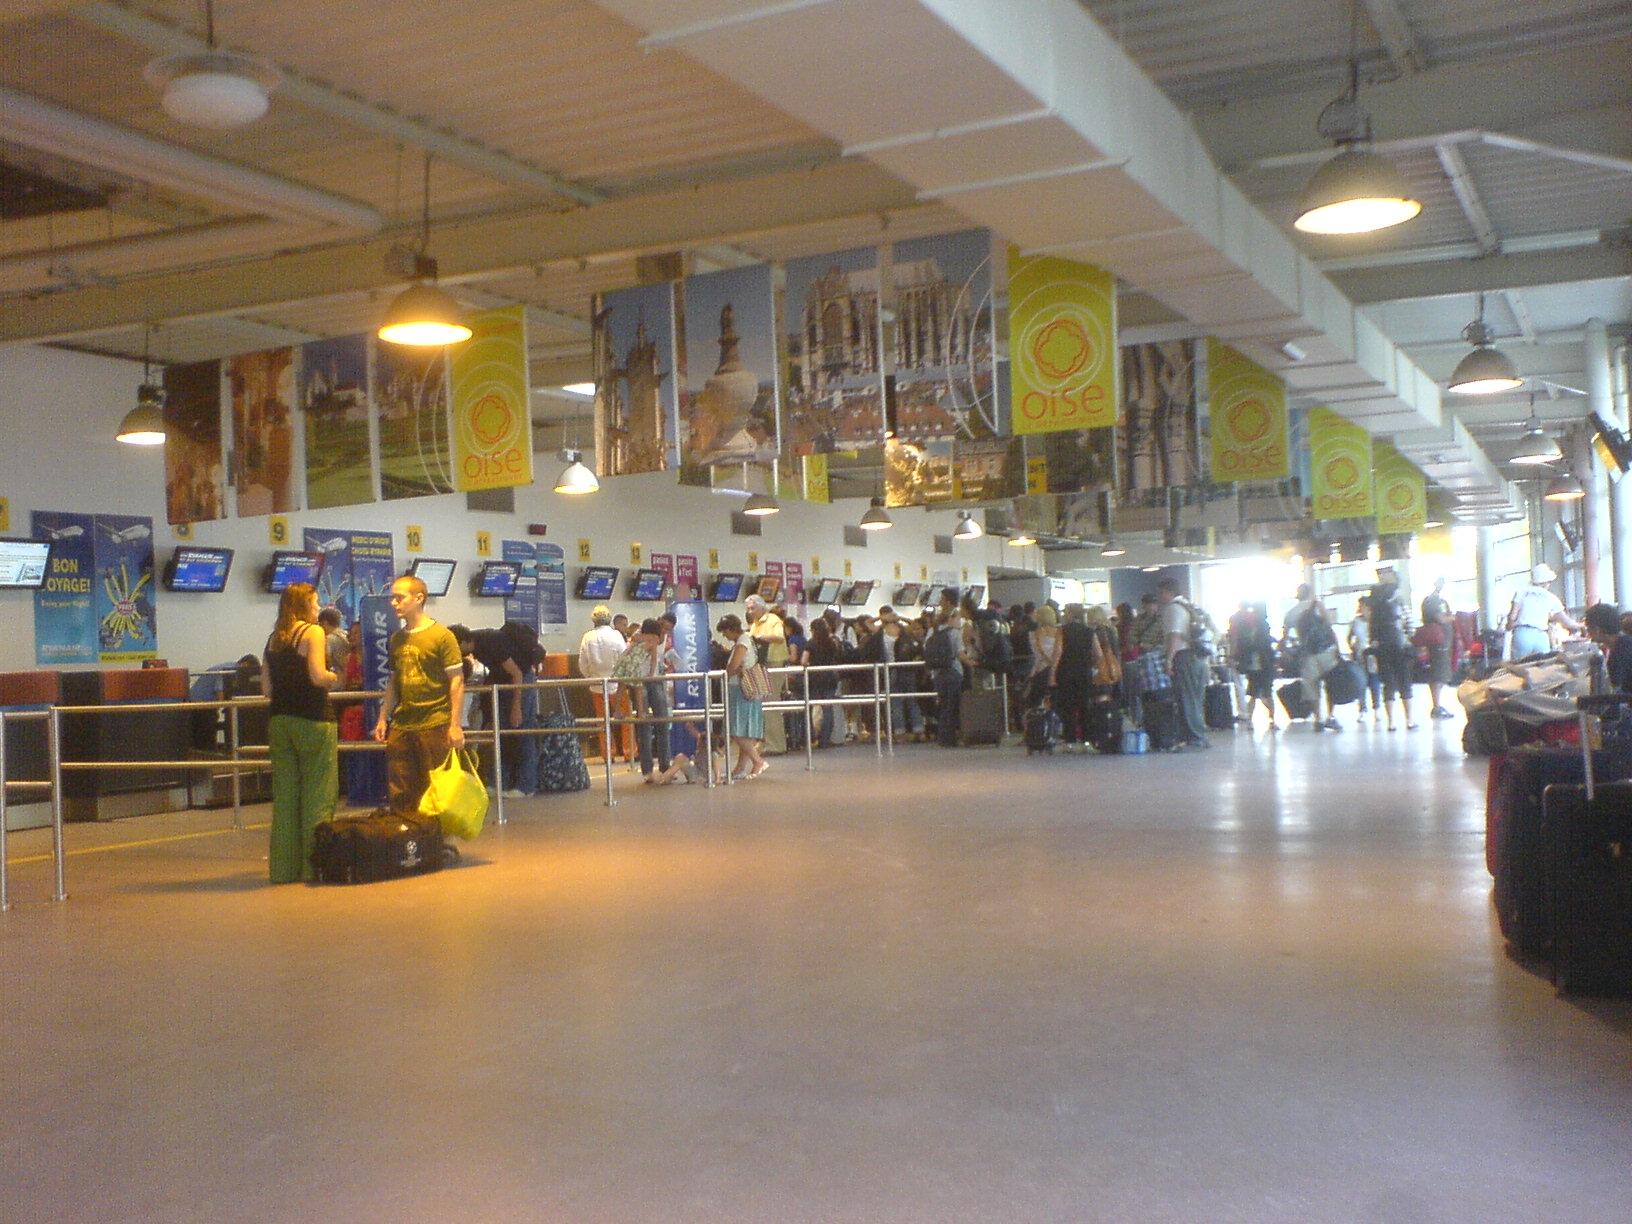 http://upload.wikimedia.org/wikipedia/commons/b/bb/Cola_en_los_mostradores_de_facturaci%C3%B3n_del_aeropuerto_Par%C3%ADs_Beauvais_Till%C3%A9.jpg